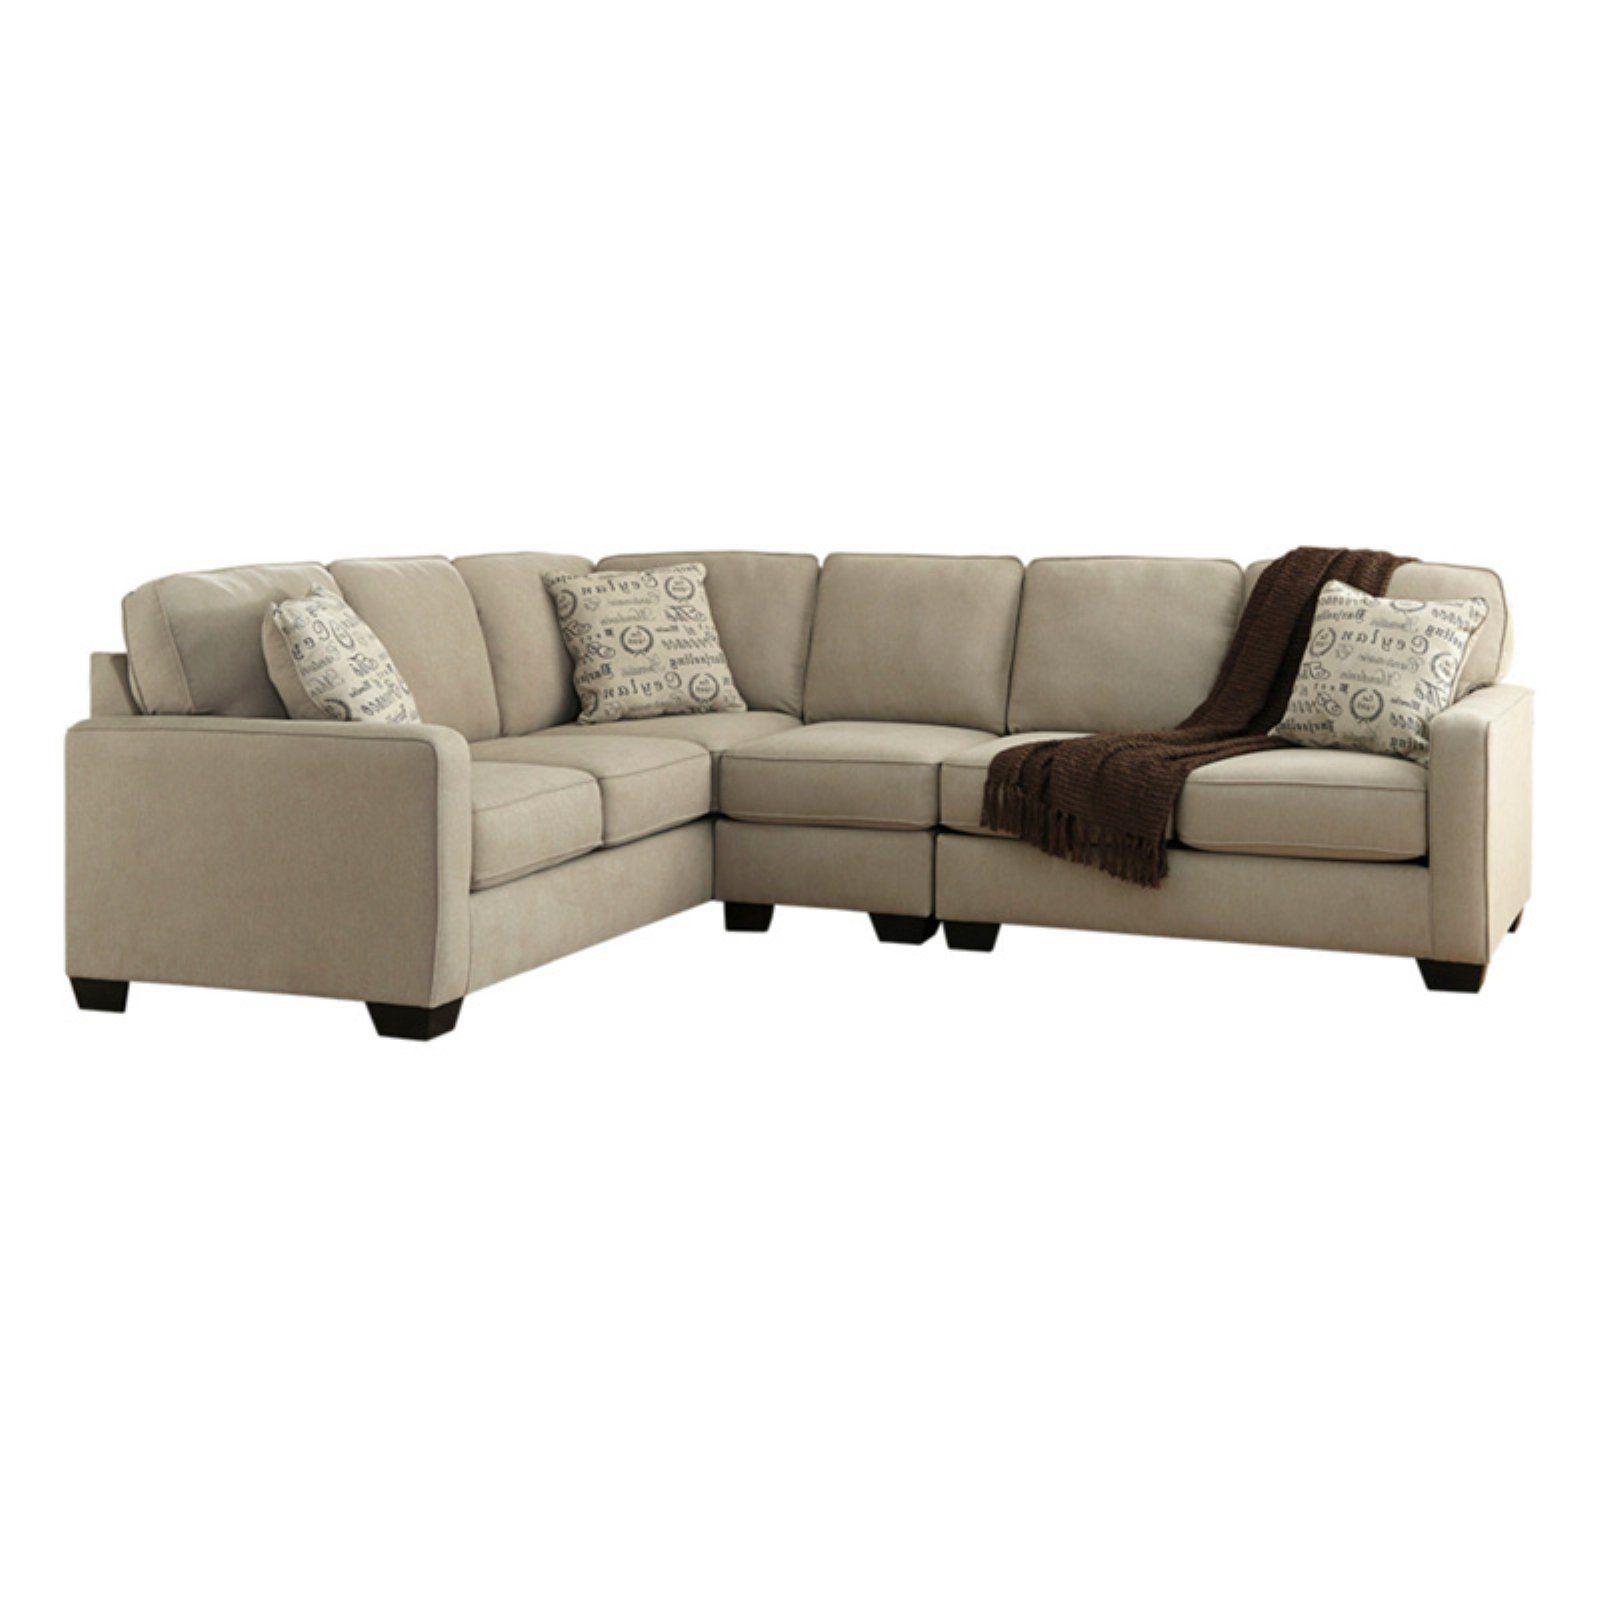 Signature Design By Ashley Alenya 6 Seat Sectional Sofa Quartz